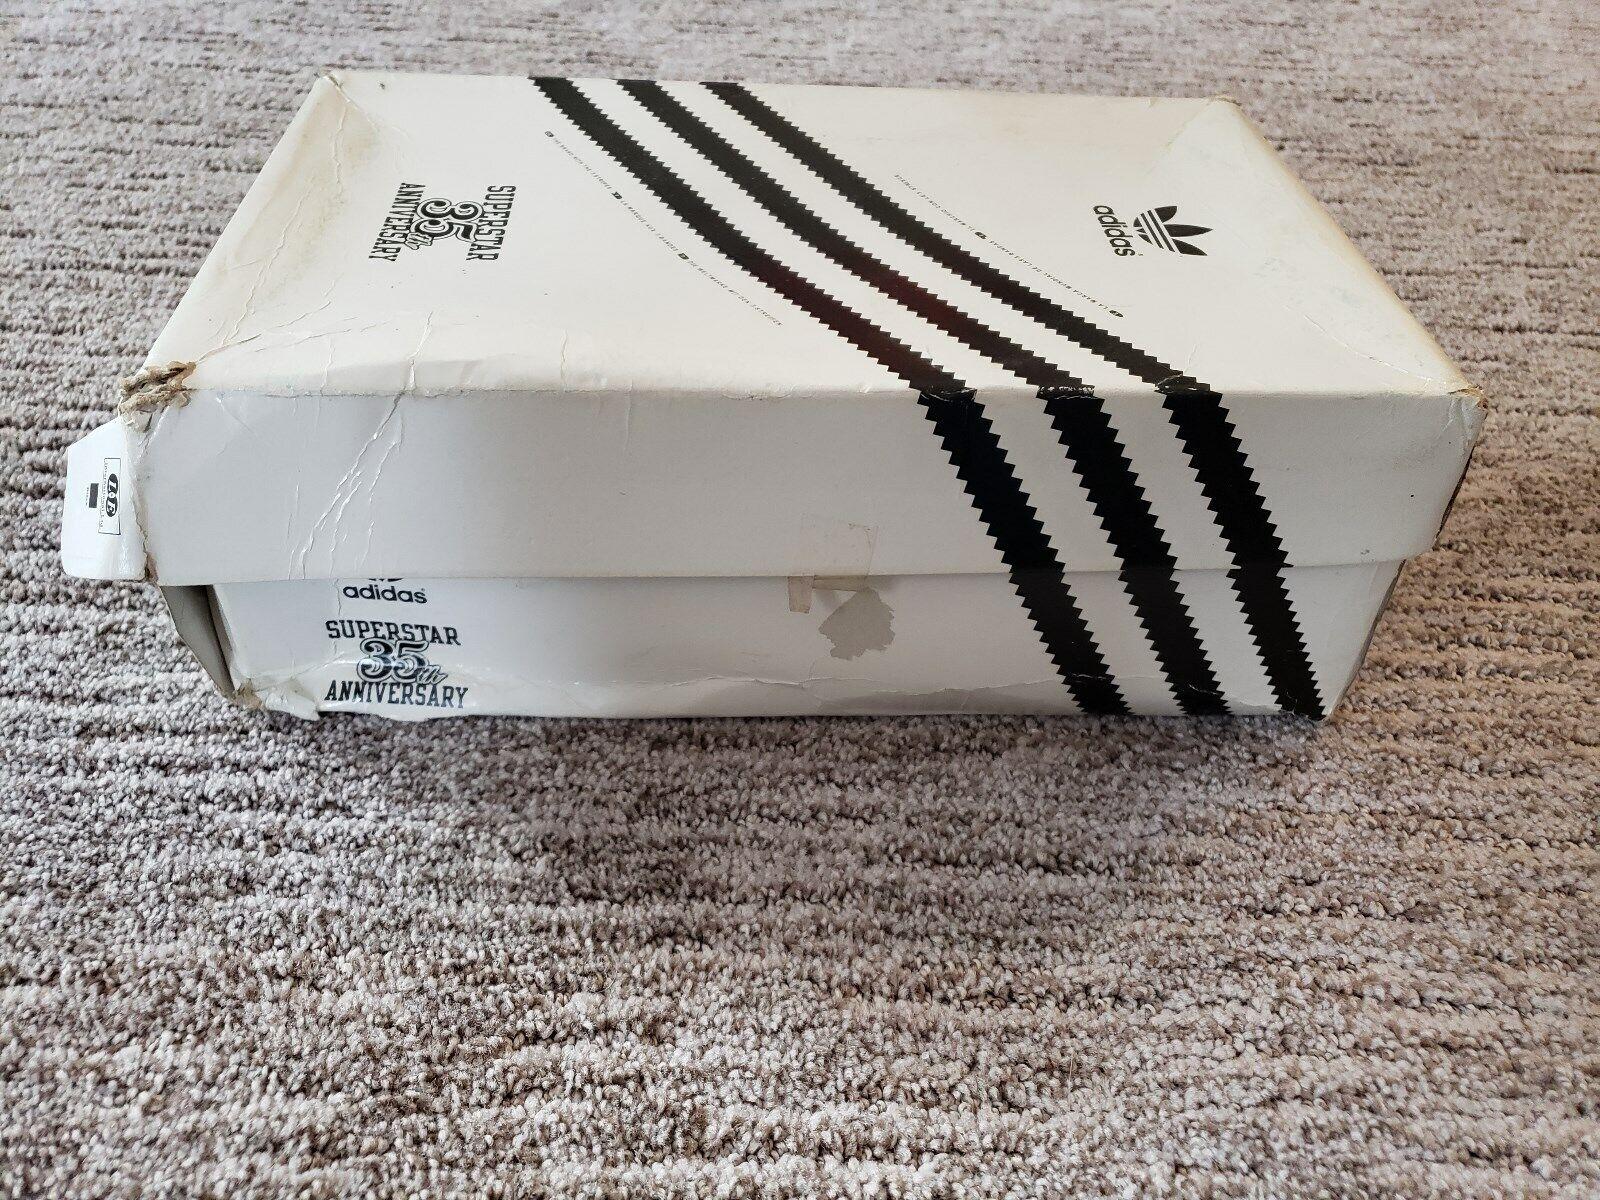 MINT 2004 Run DMC Adidas 35th Anniversary Superstar JMJ White Shell Top 9.5